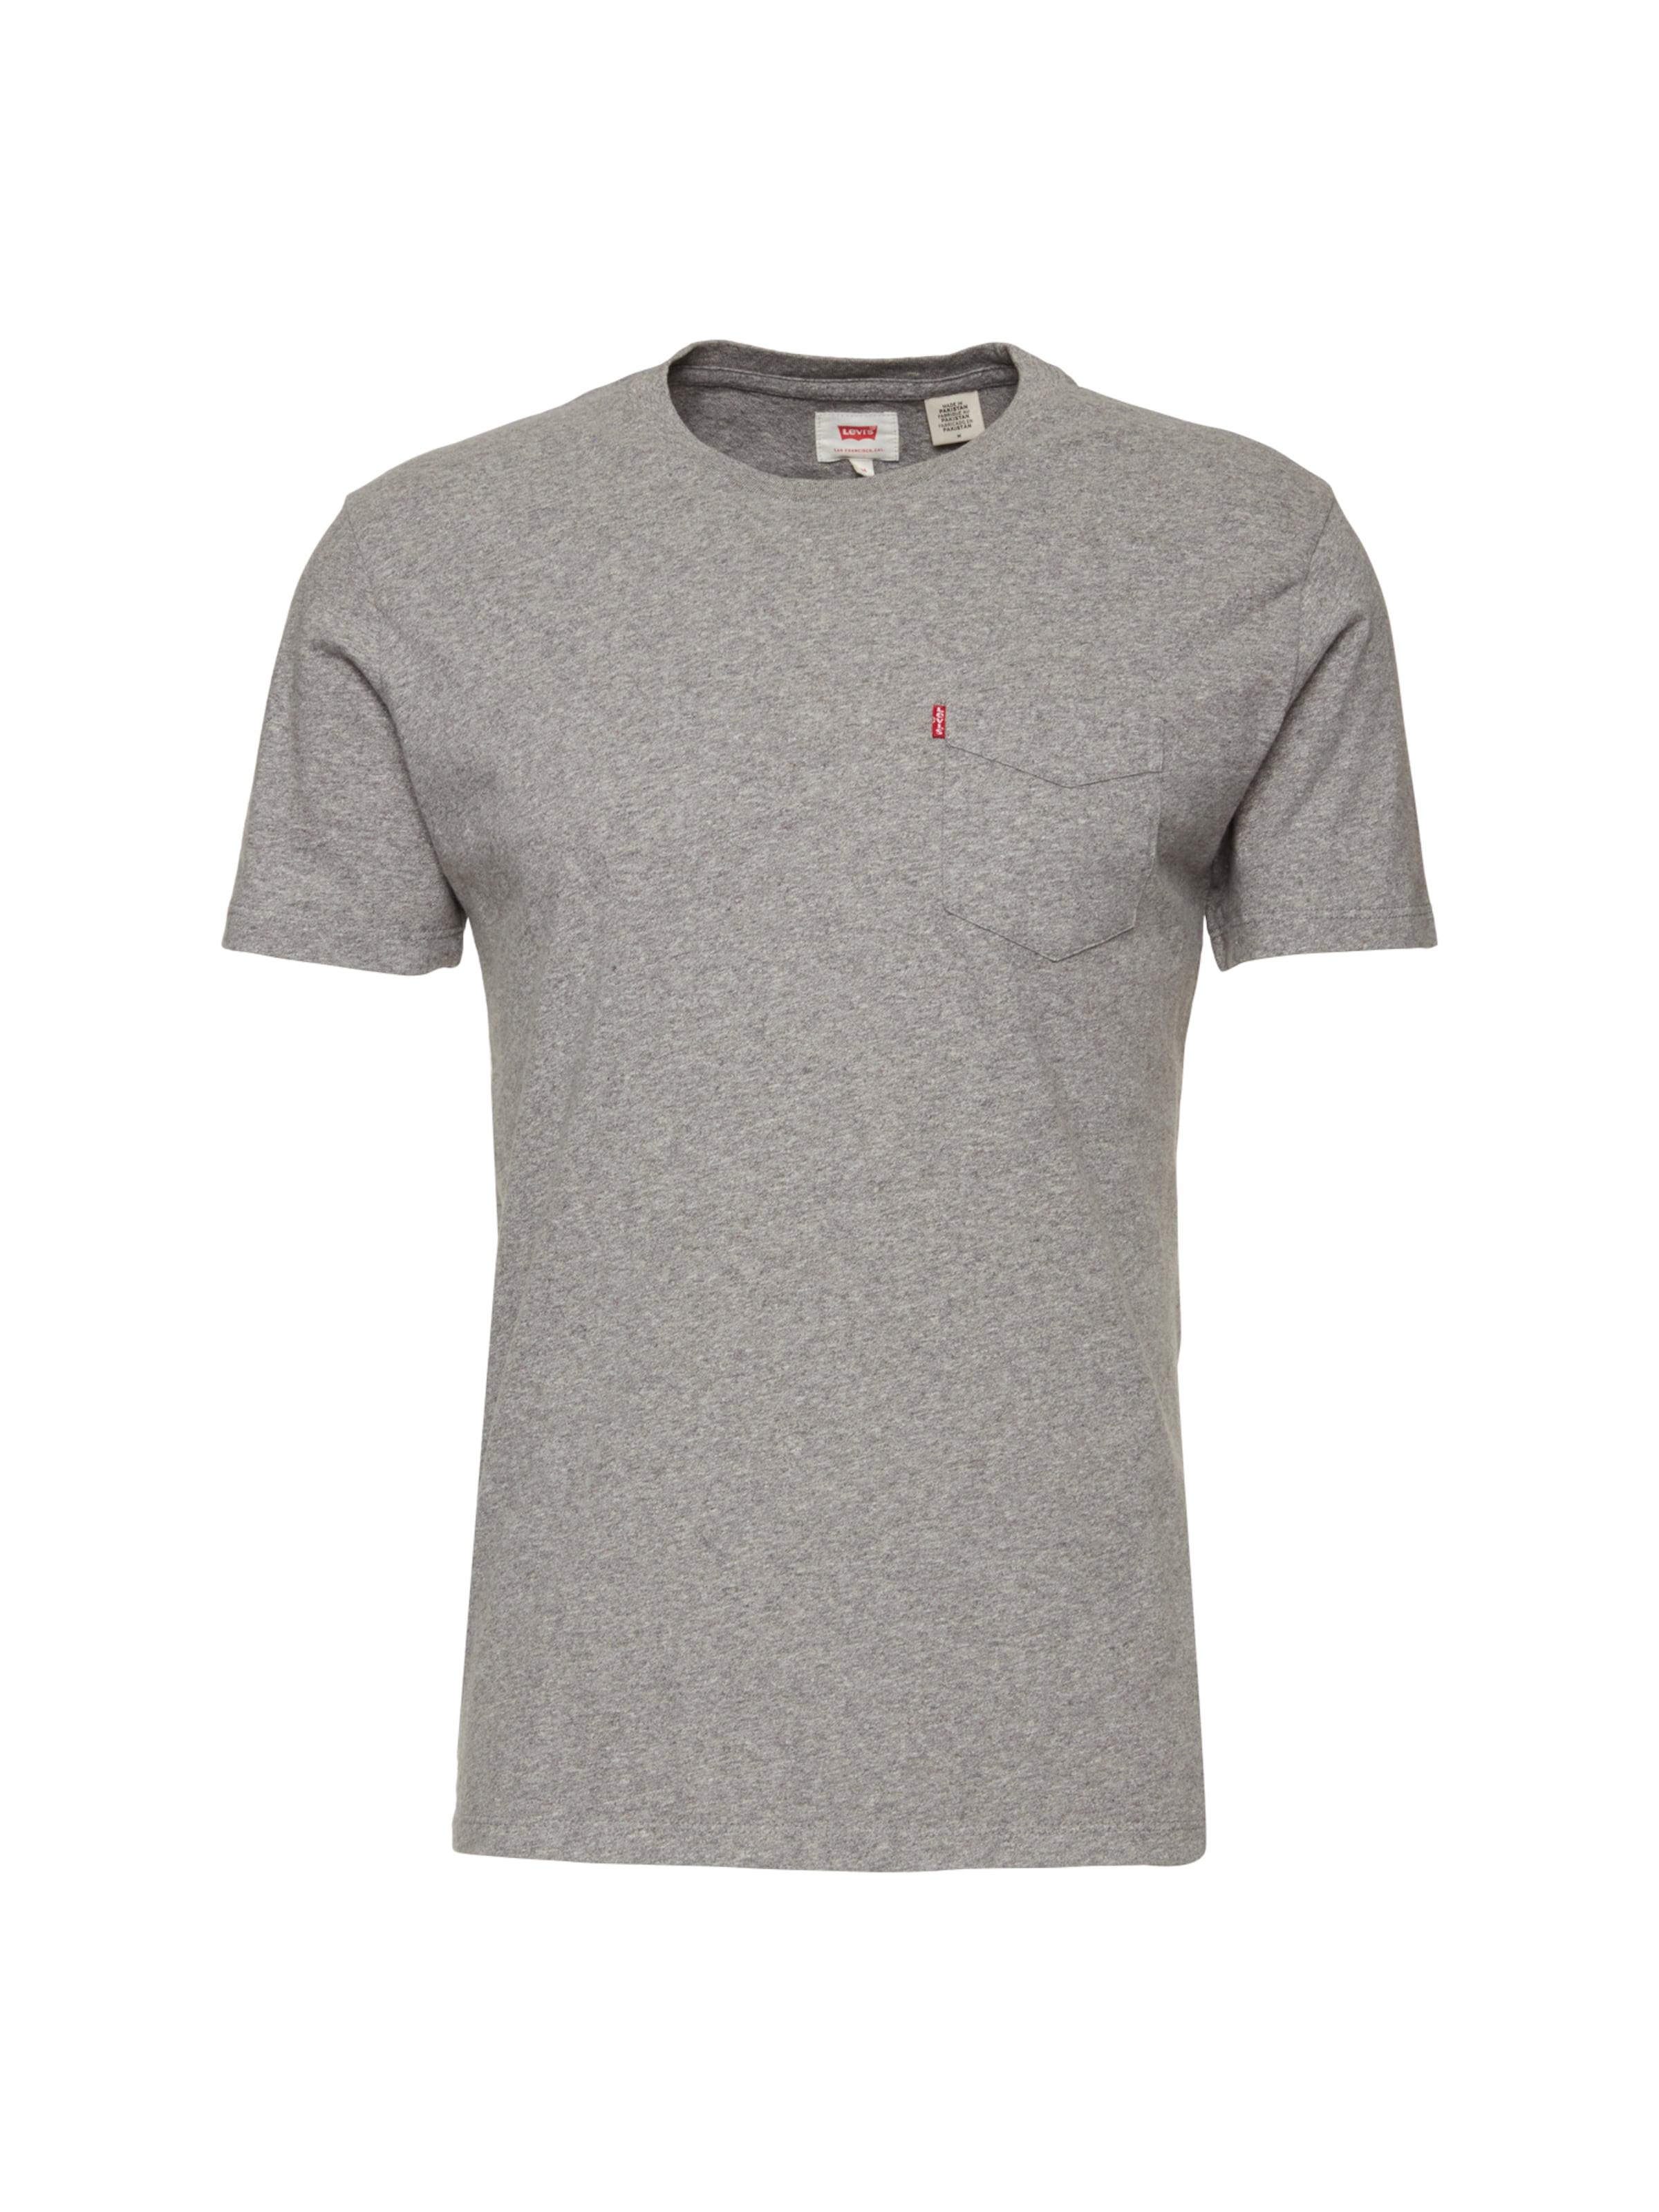 shirt En Levi's T Levi's T shirt Noir En WD9IY2EHe